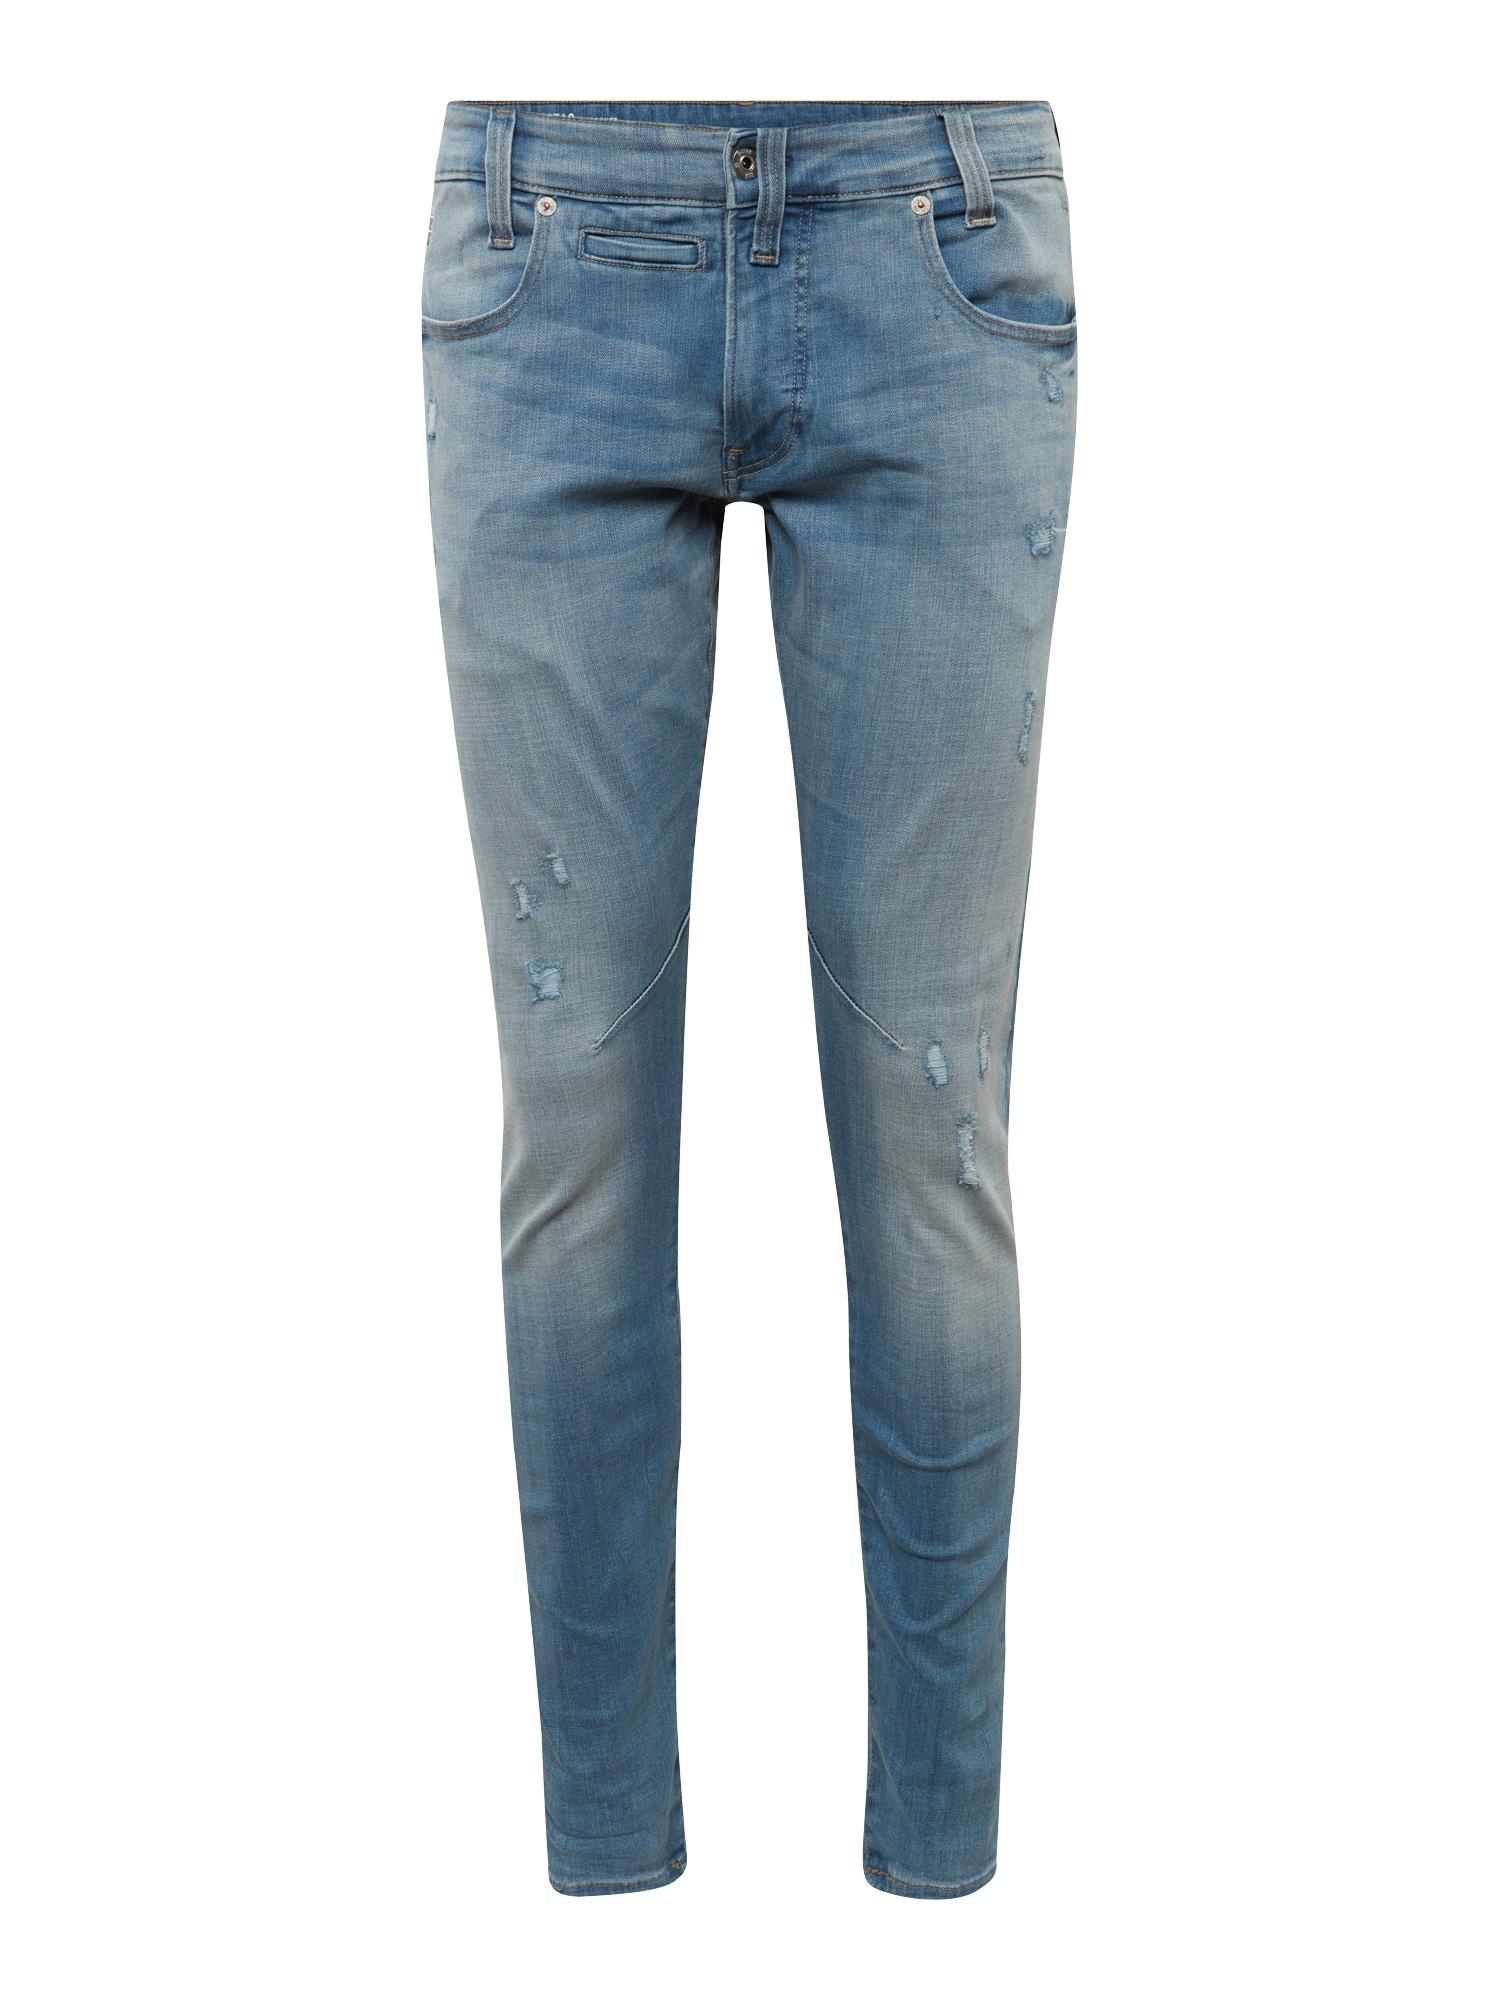 G-STAR RAW Heren Jeans D-Staq 5-Pkt Skinny blauw denim